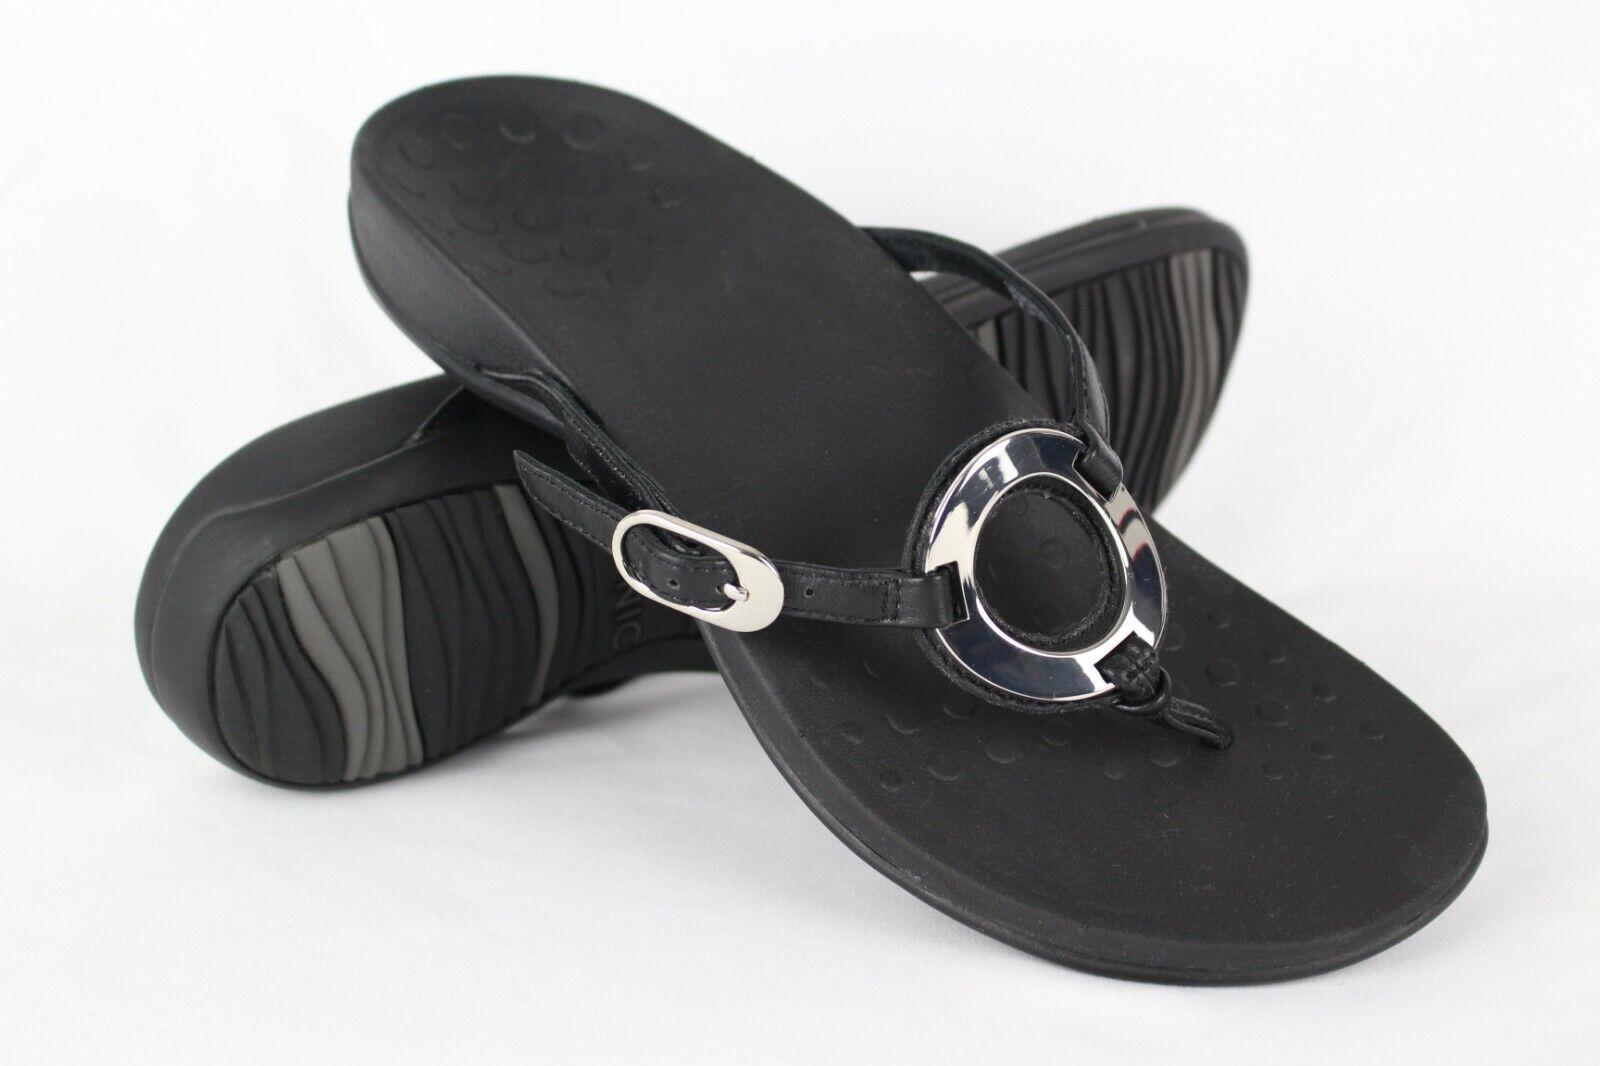 New Vionic Orthaheel Donna  Rest Karina Thong Sandals Dimensione Dimensione Dimensione 7m nero e0cf47